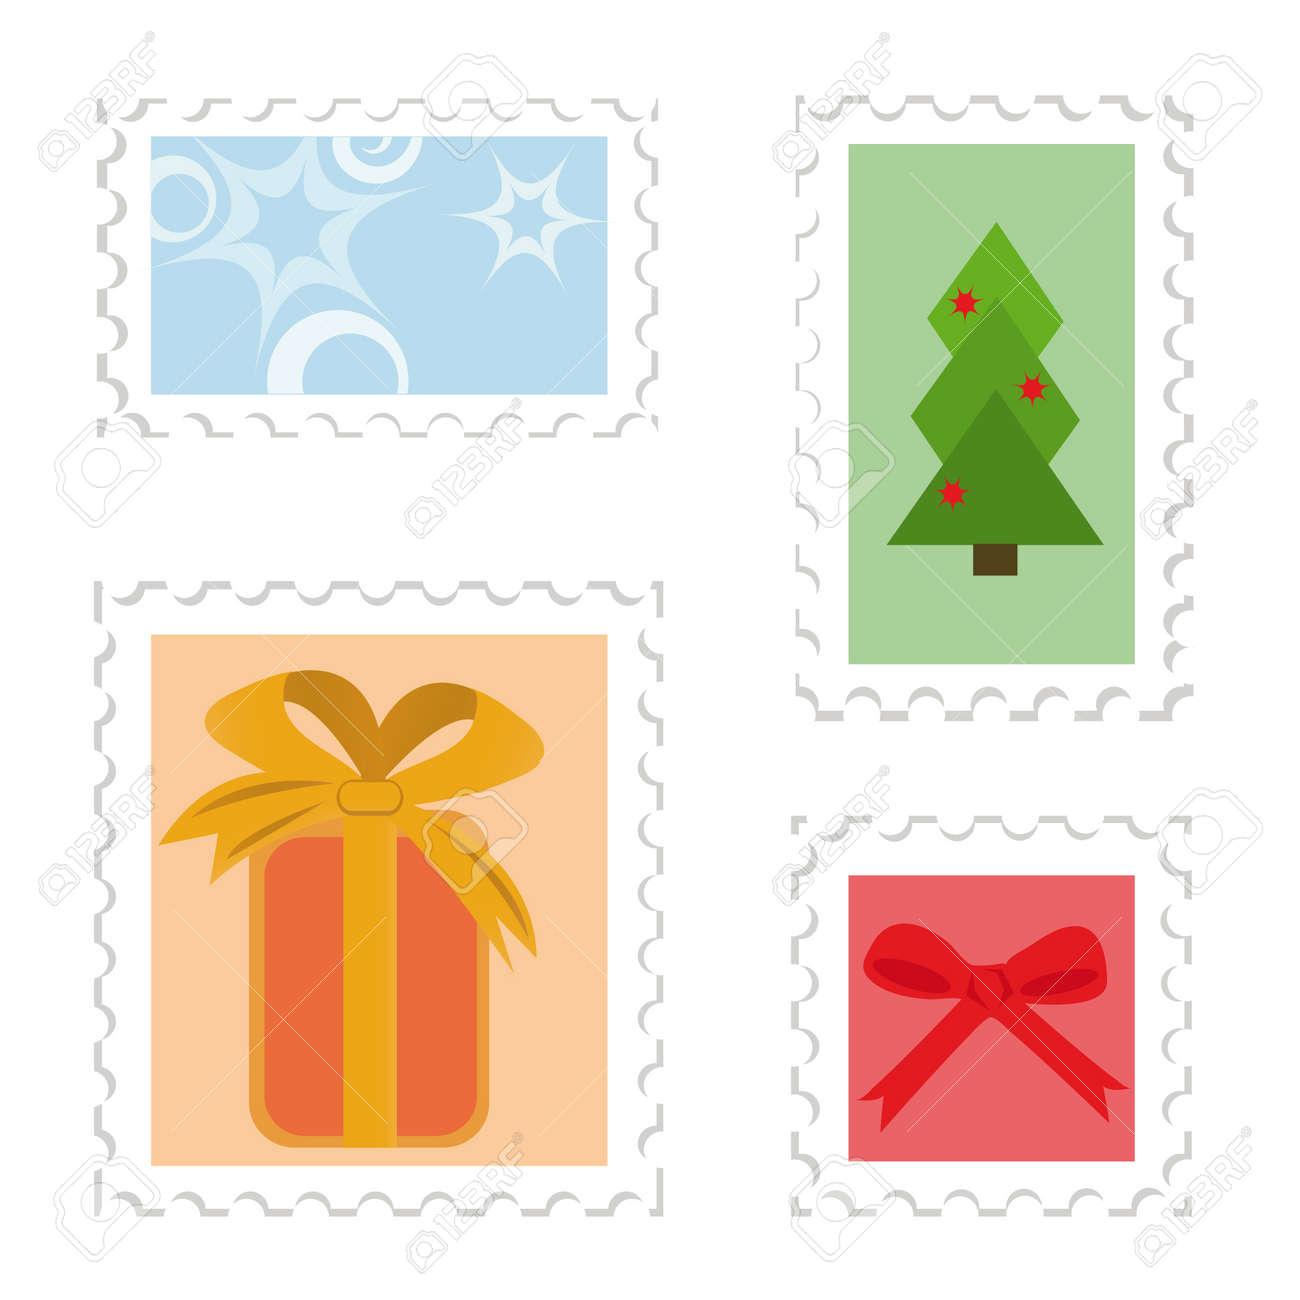 Set of postage stamps. Christmas theme (gift box, christmas tree, star, red bow) Stock Vector - 3768403